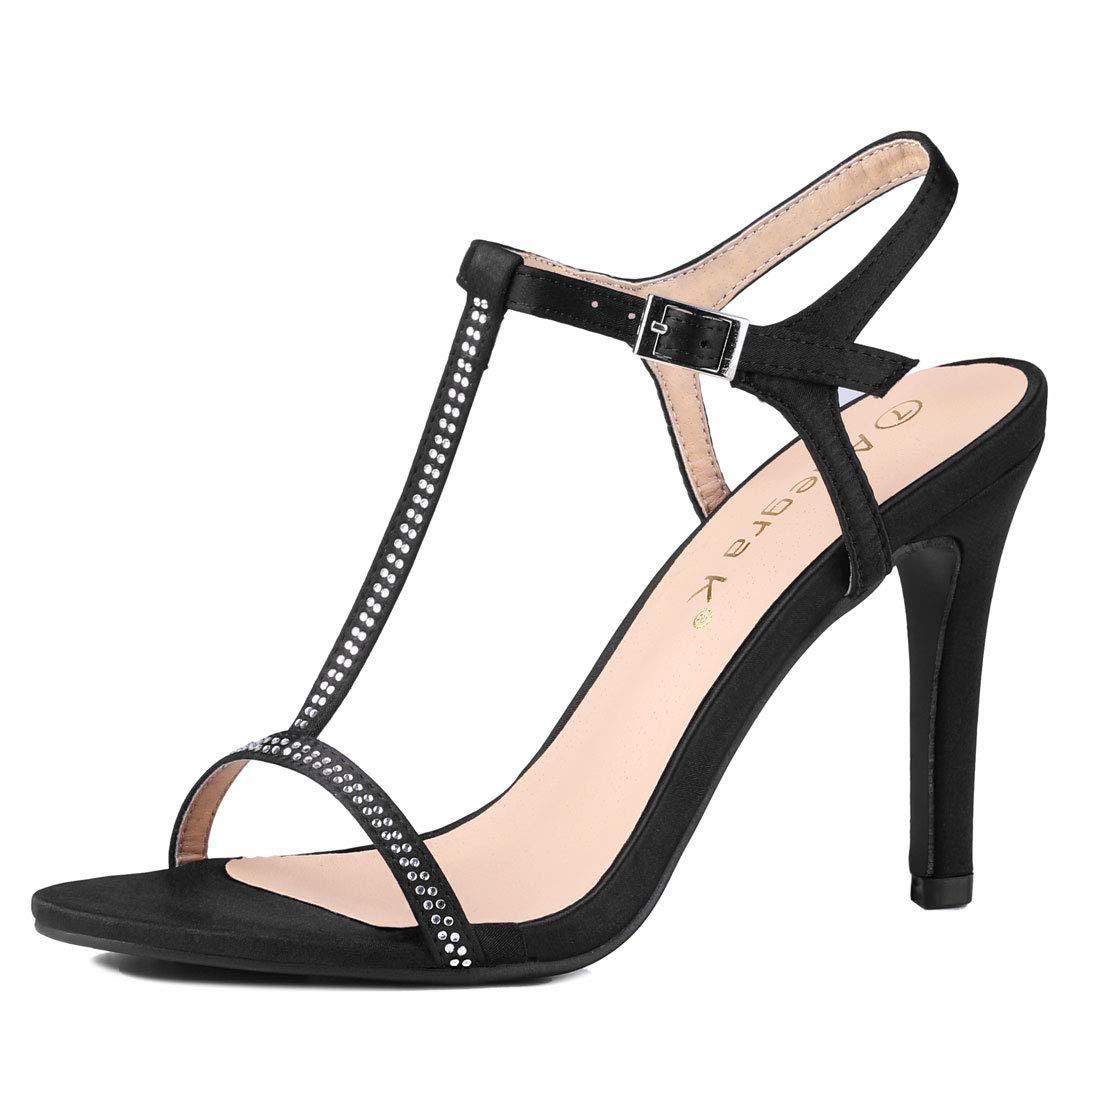 d3cd6a6a03f68 Allegra K Women's Rhinestone T-Strap Stiletto High Heel Sandals